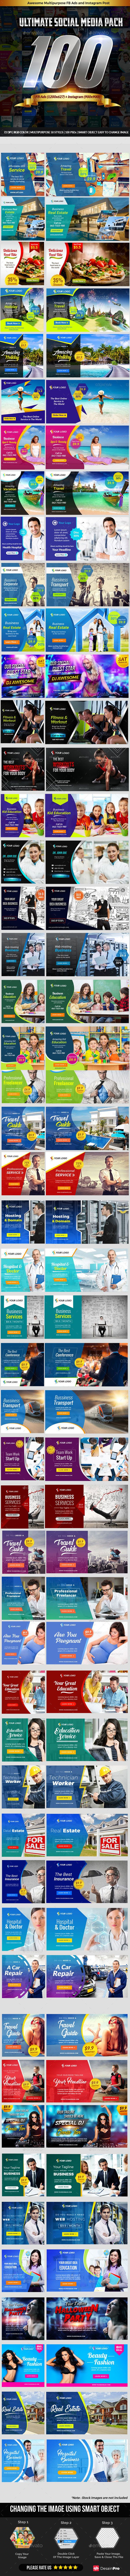 Megapack Social Media Facebook Ads Instagram Templates - Banners & Ads Web Elements